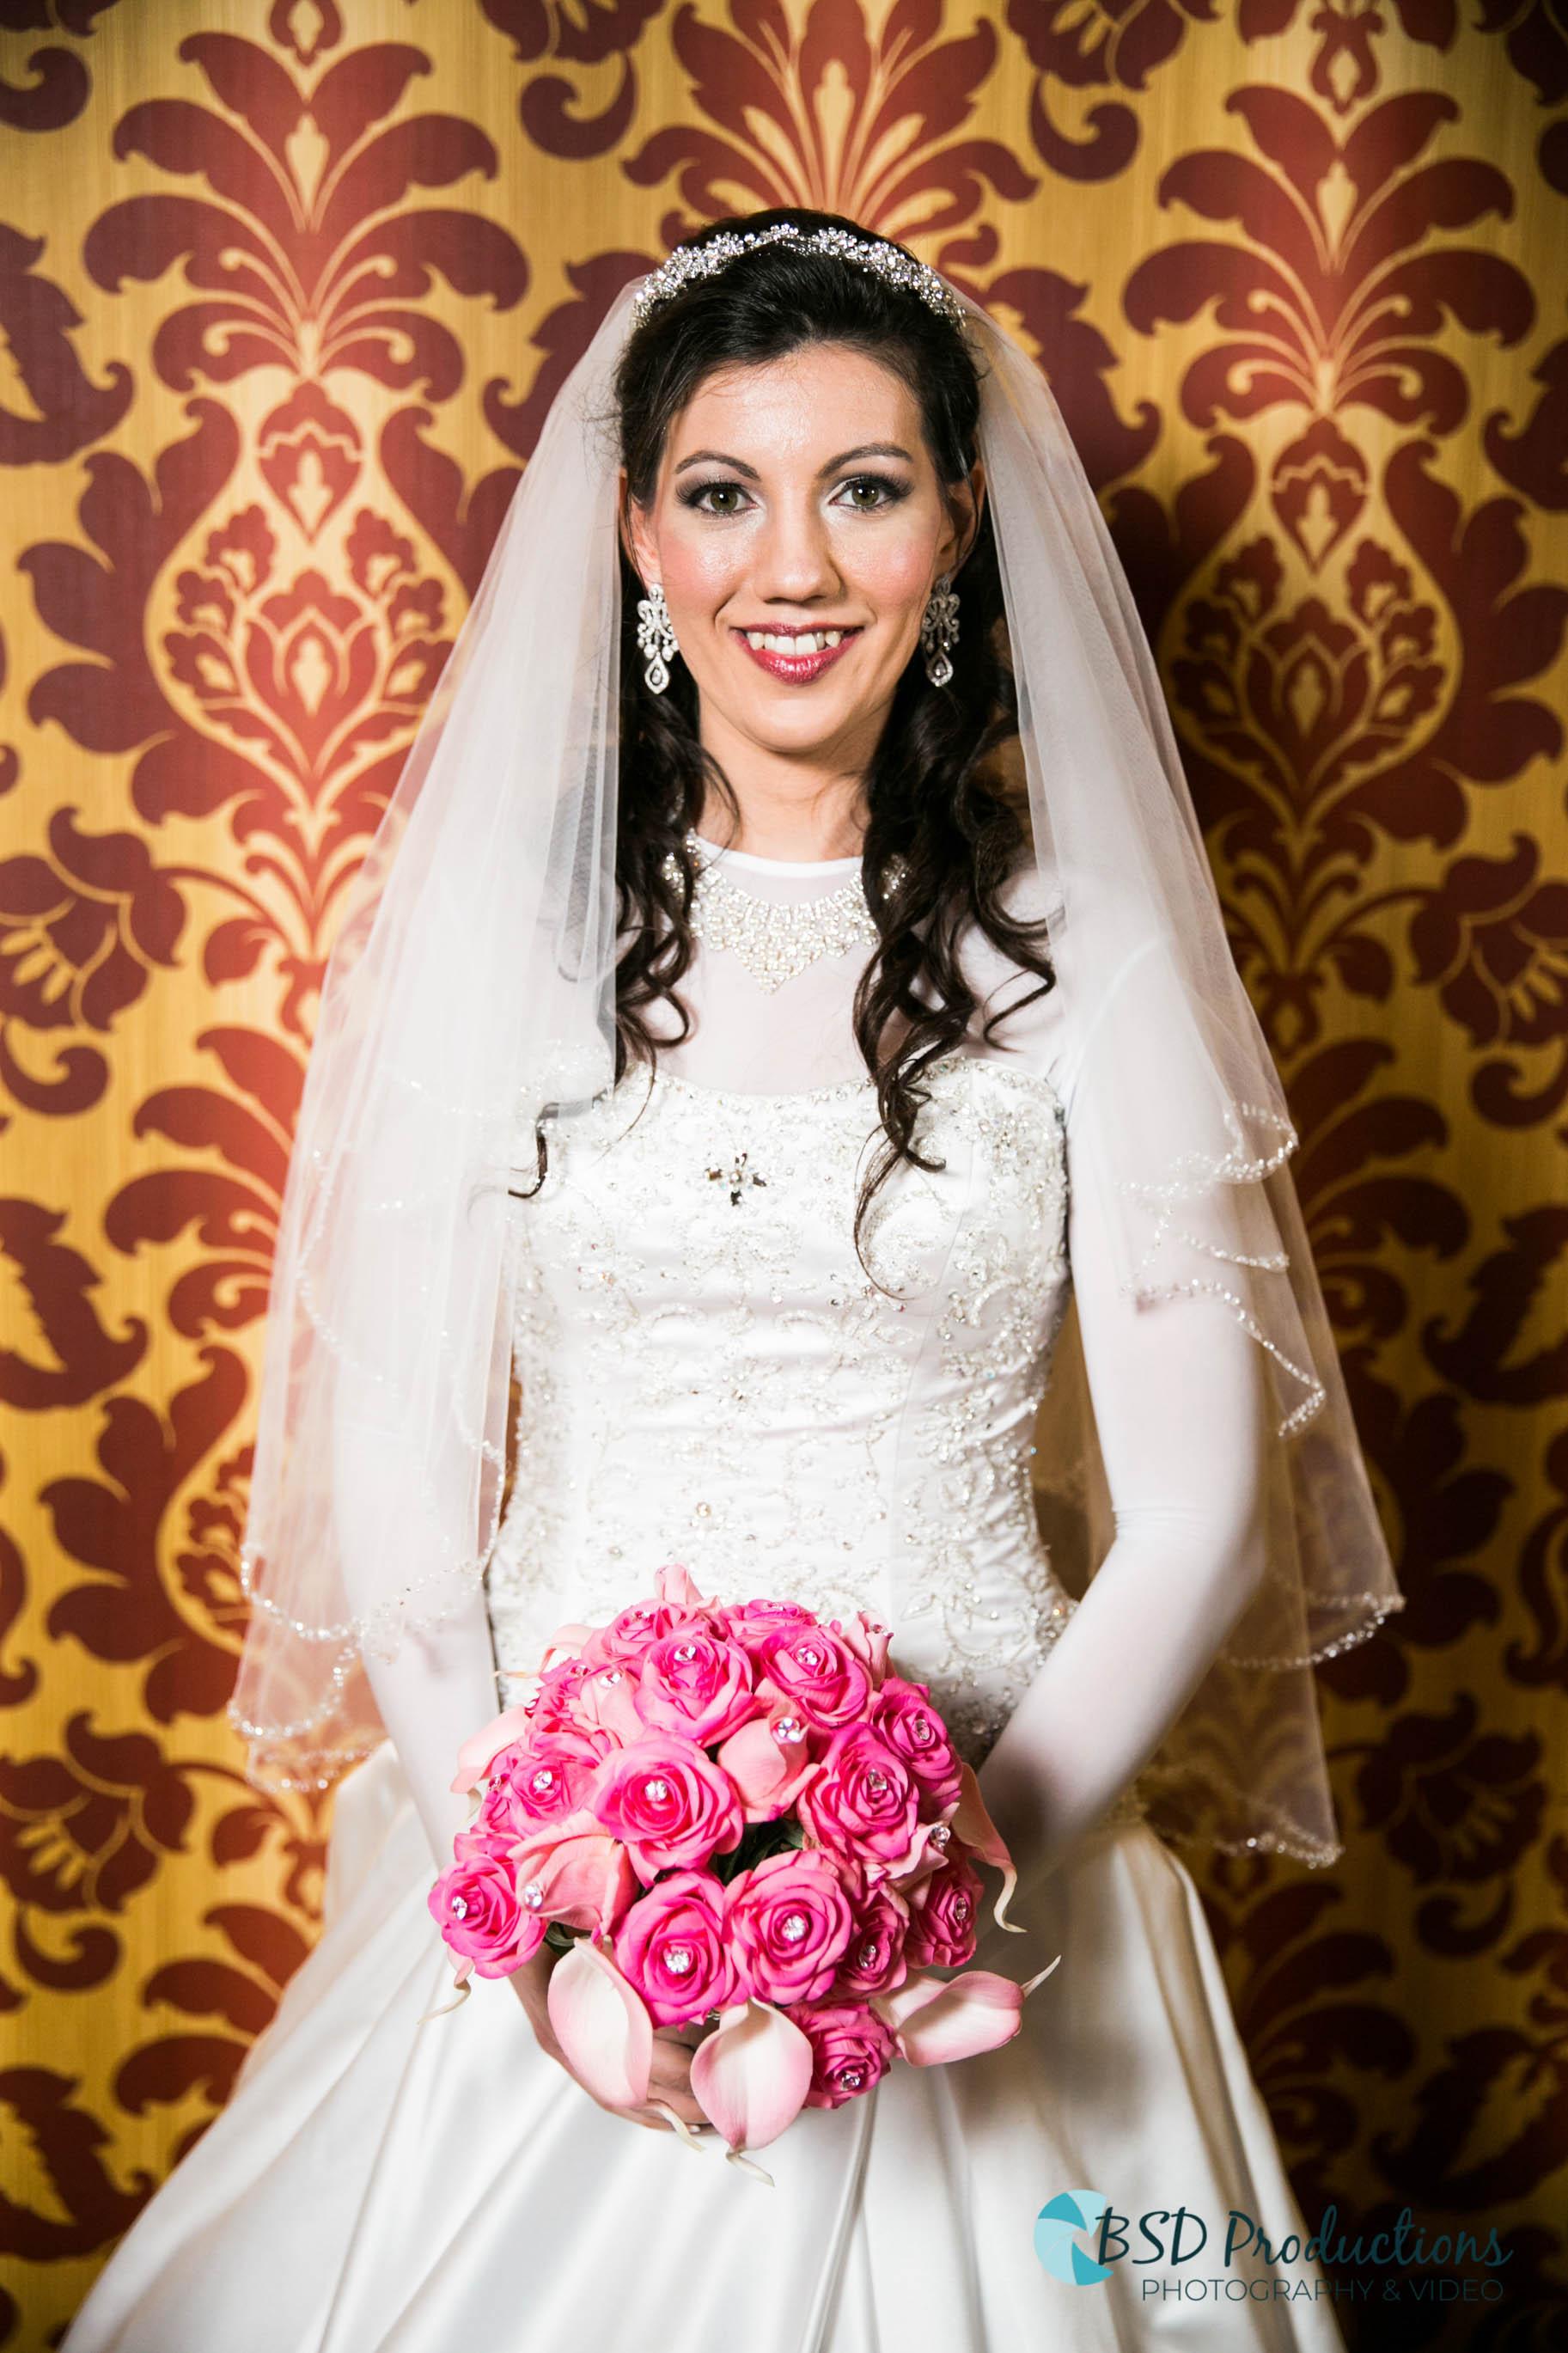 D_R_9815 Wedding – BSD Productions Photography